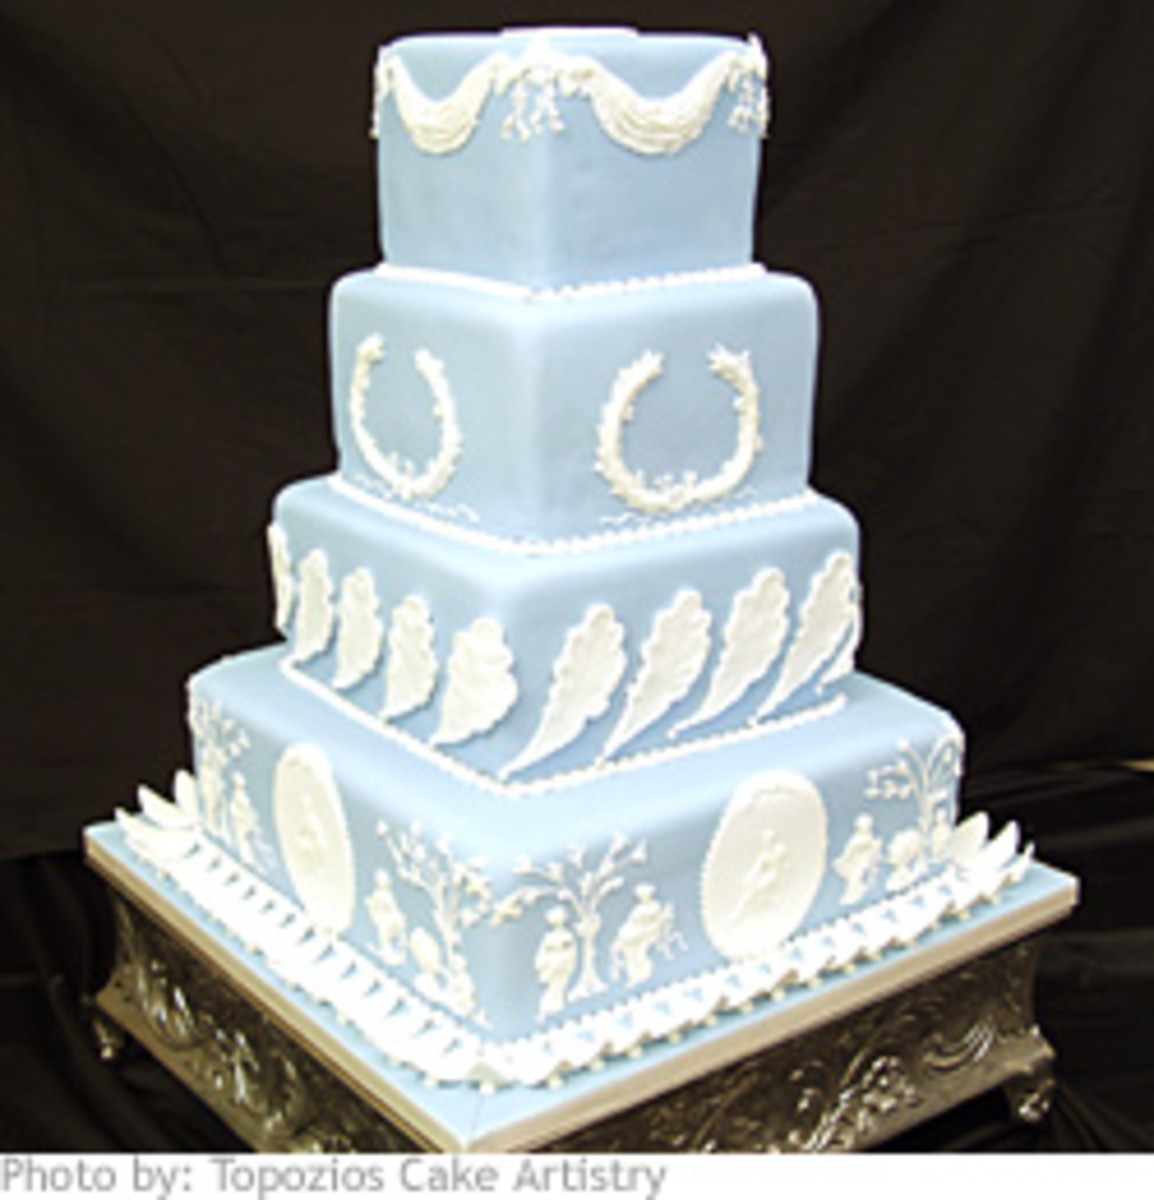 The Yellow Cake Assertion